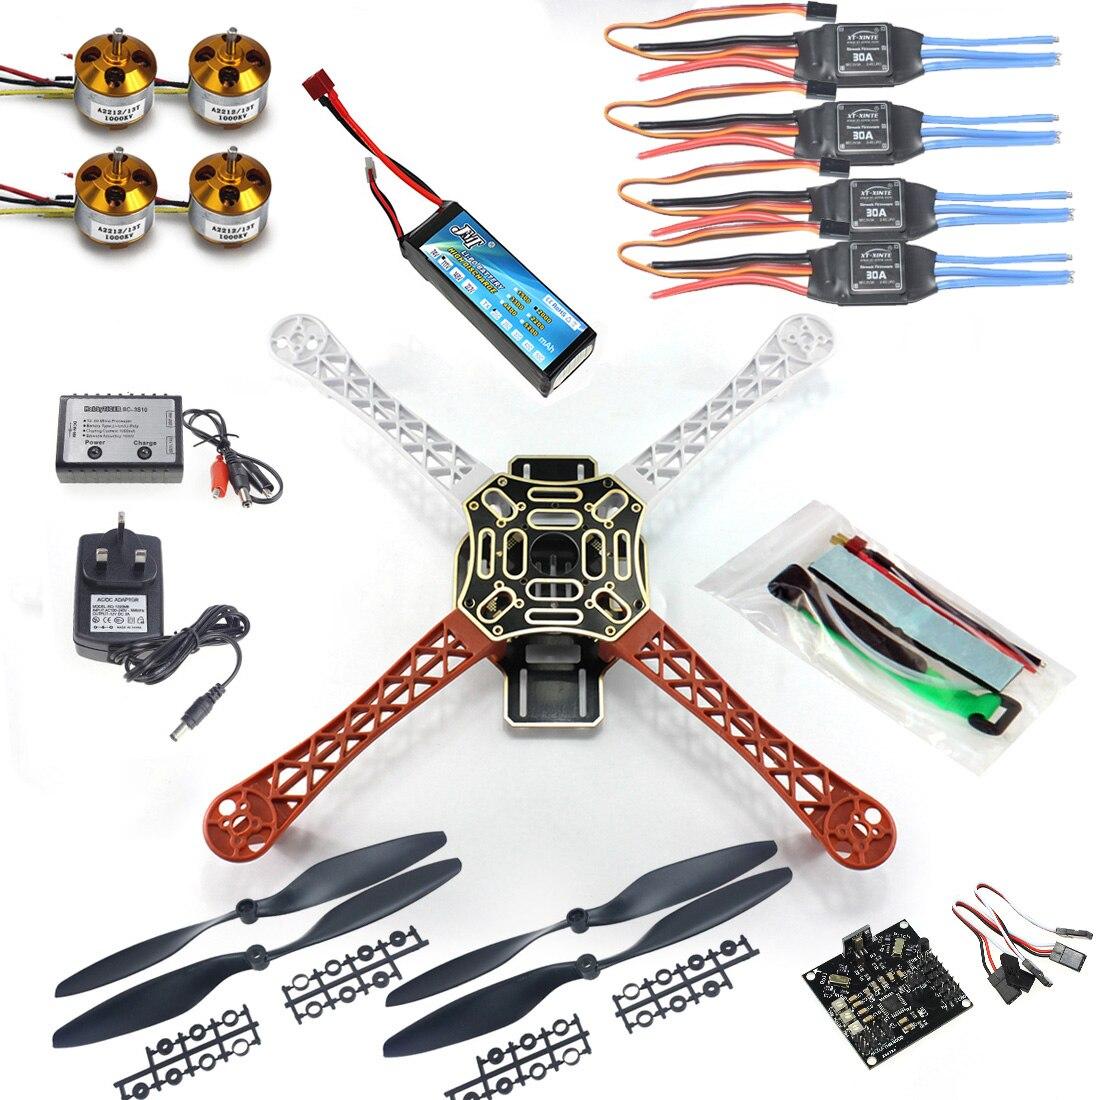 F02192-B RC Quadcopter 4 axle Drone ARF Kit No TX RX : KK V2.3 Flight Control A2212 1000KV Motor 30A ESC Lipo F450 Flamewheel Fs diy 4 axle rc multi quadcopter drone with kk v2 3 circuit board 1000kv motor 30a esc f450 frame kit radiolink t8fb 8ch tx